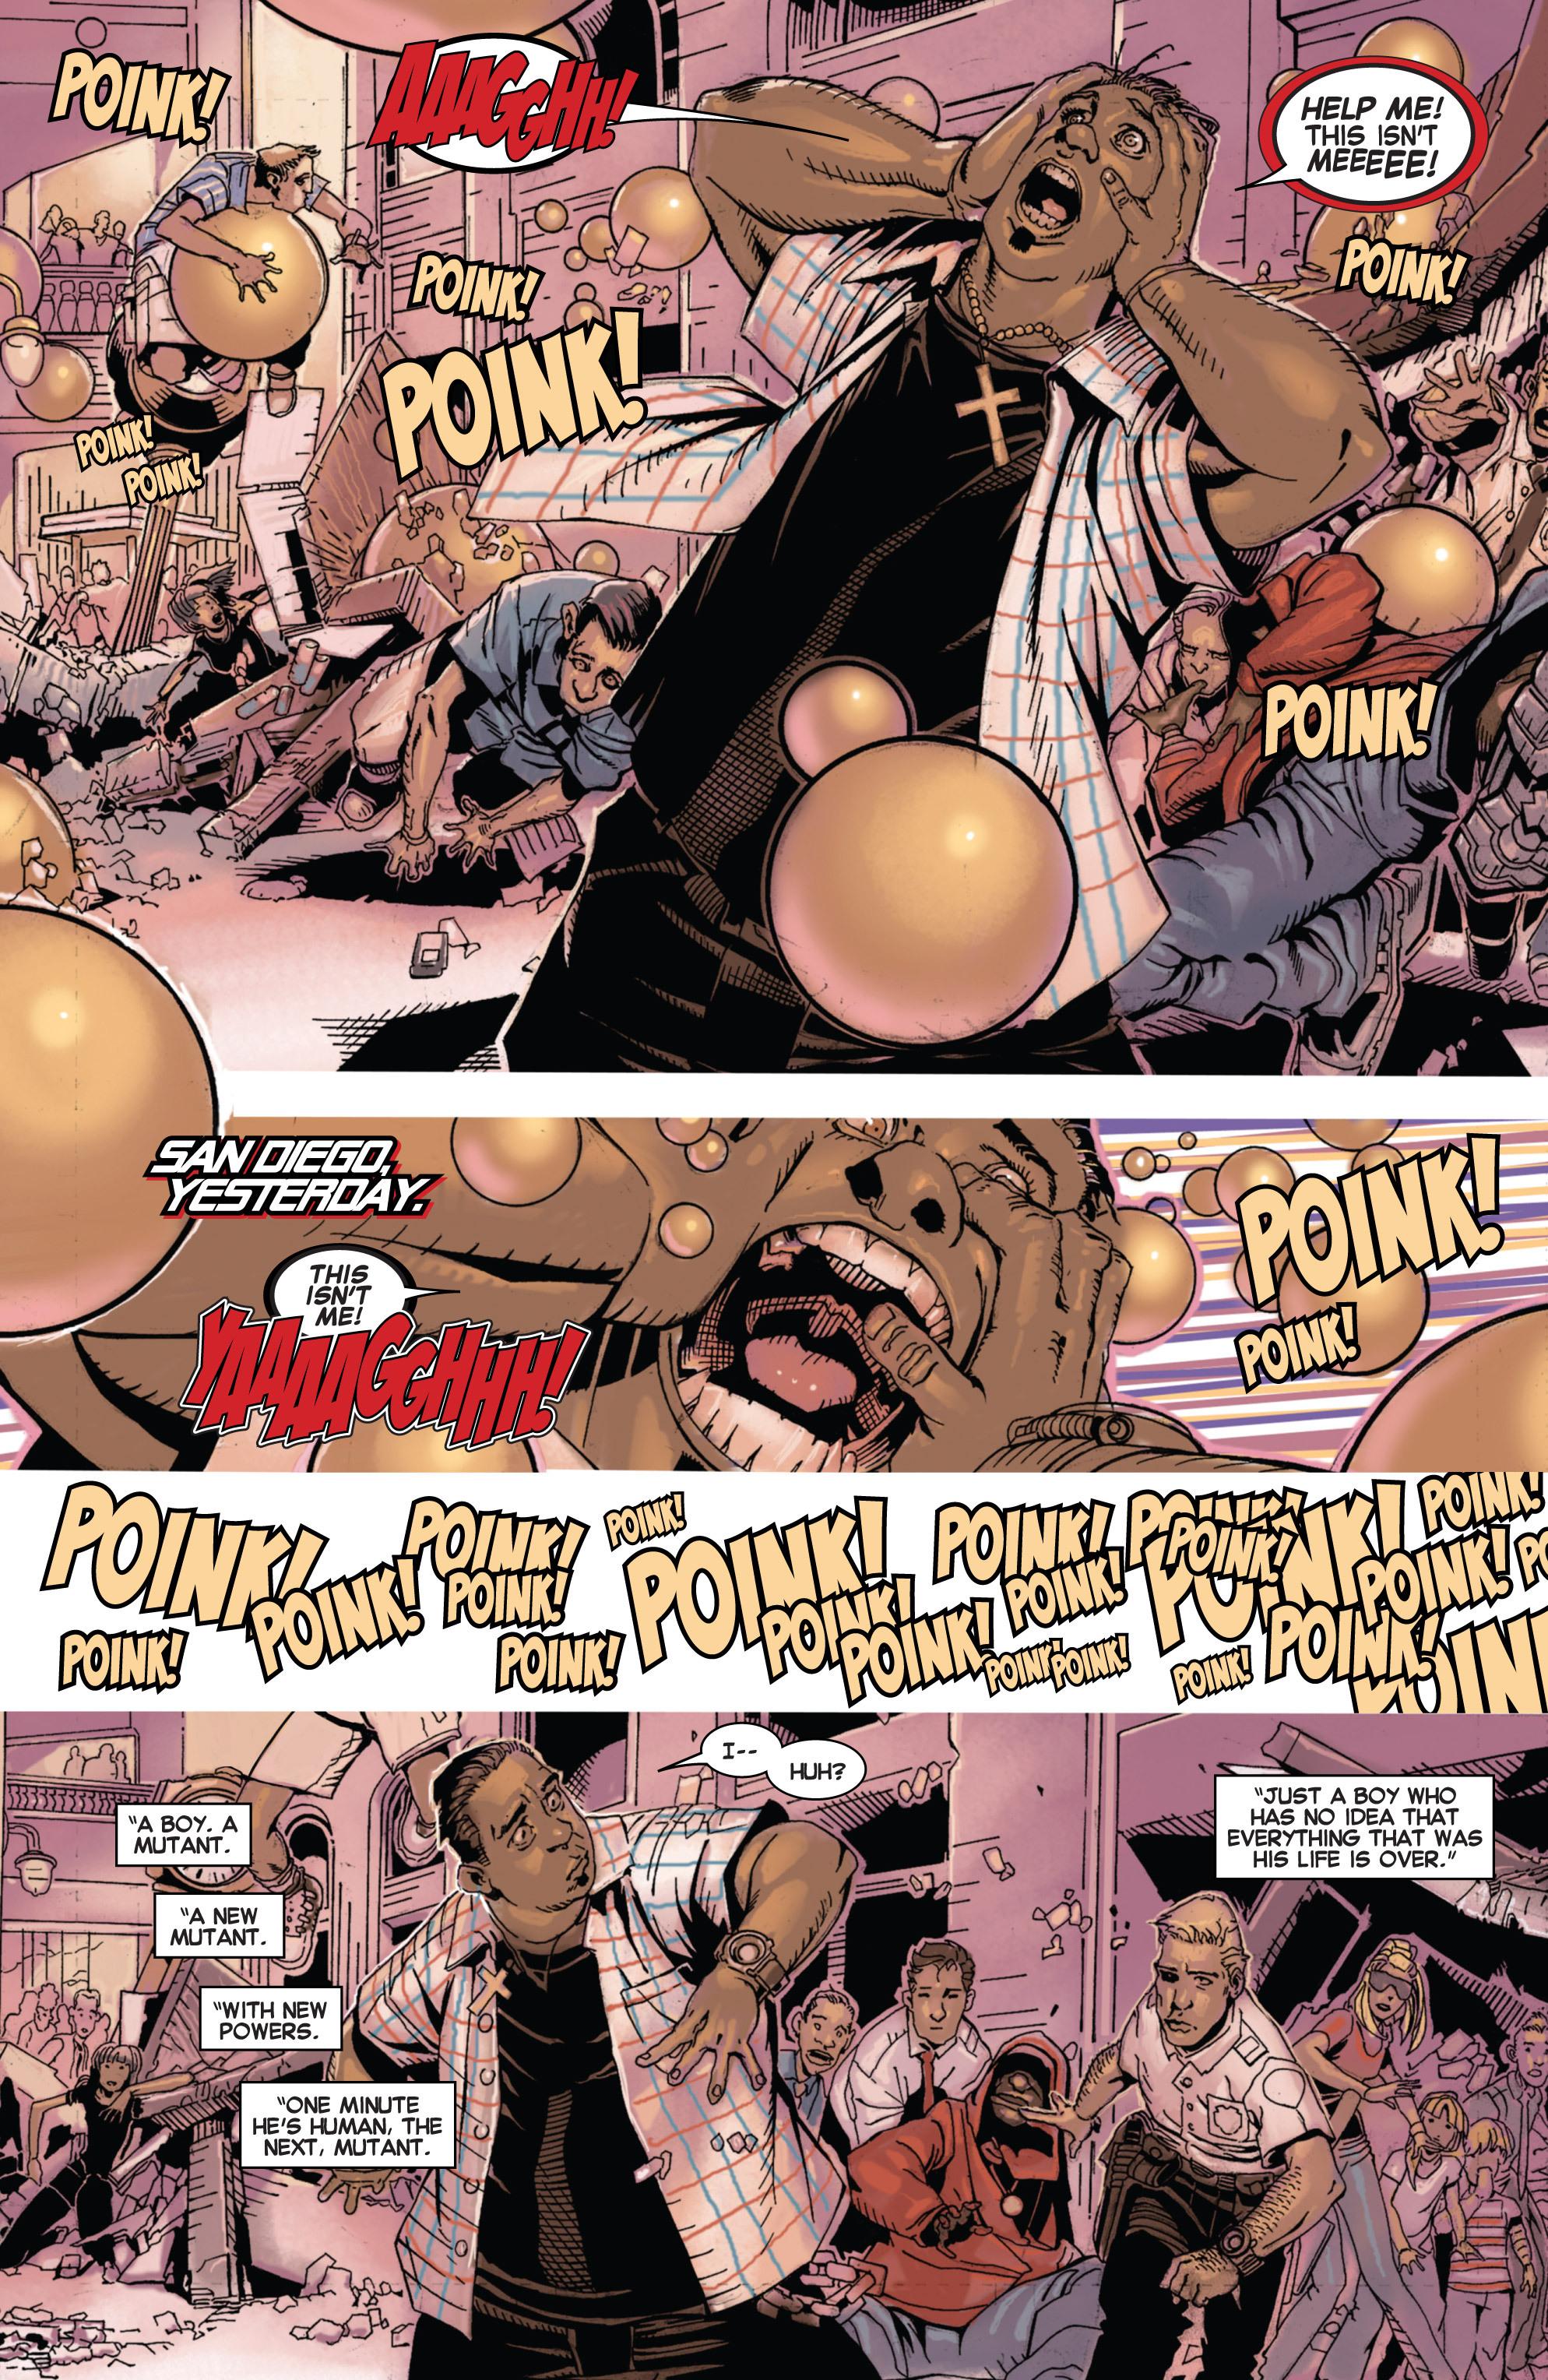 Read online Uncanny X-Men (2013) comic -  Issue # _TPB 1 - Revolution - 11